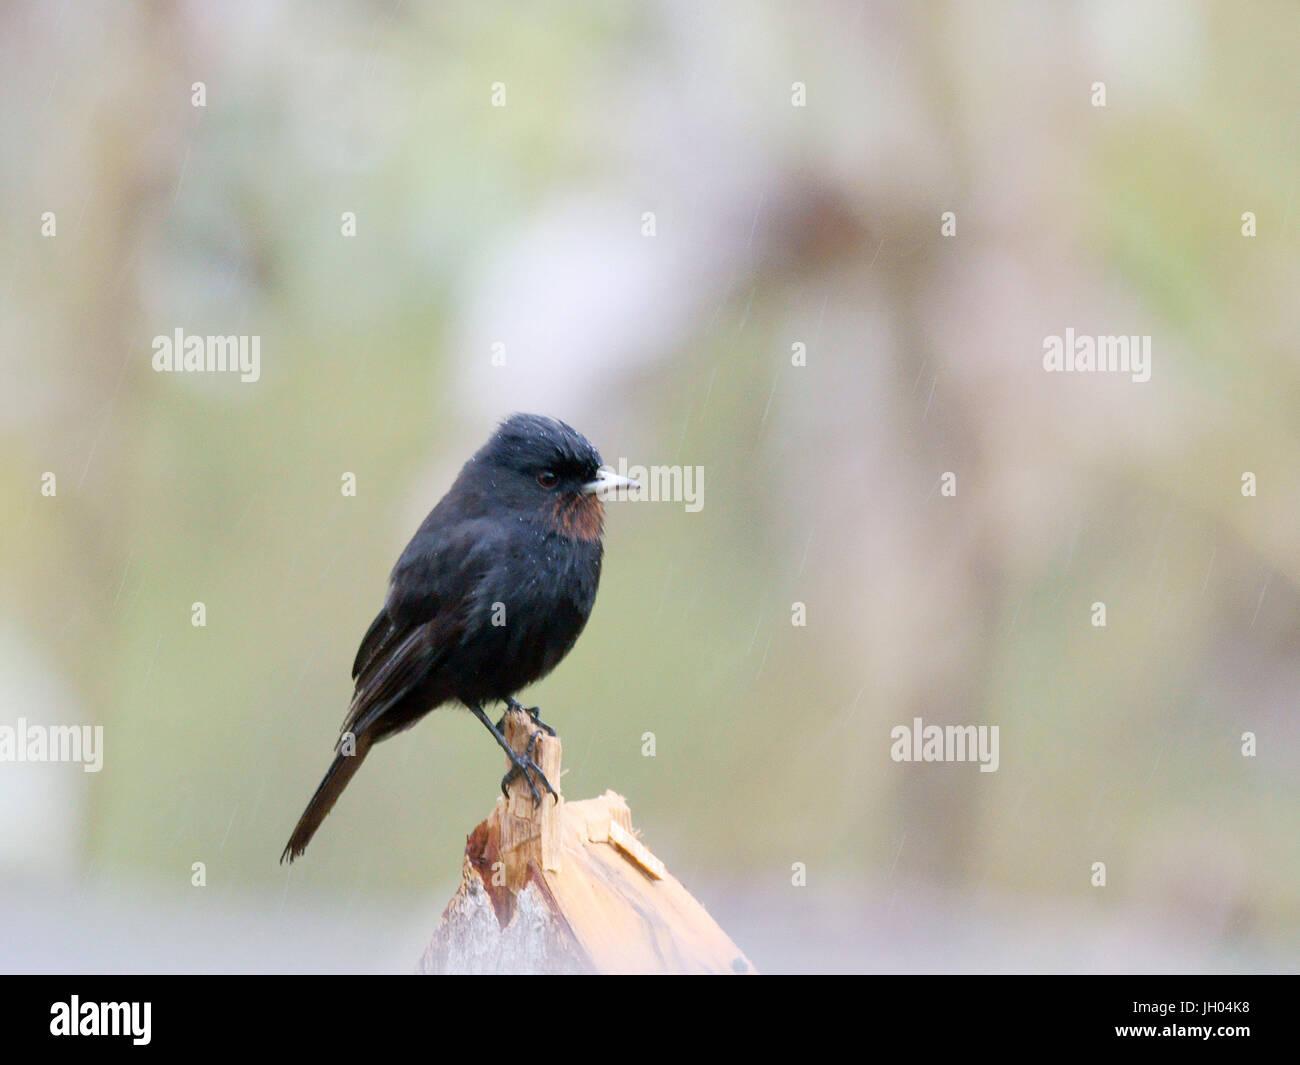 Black Bird With Red Throat 4